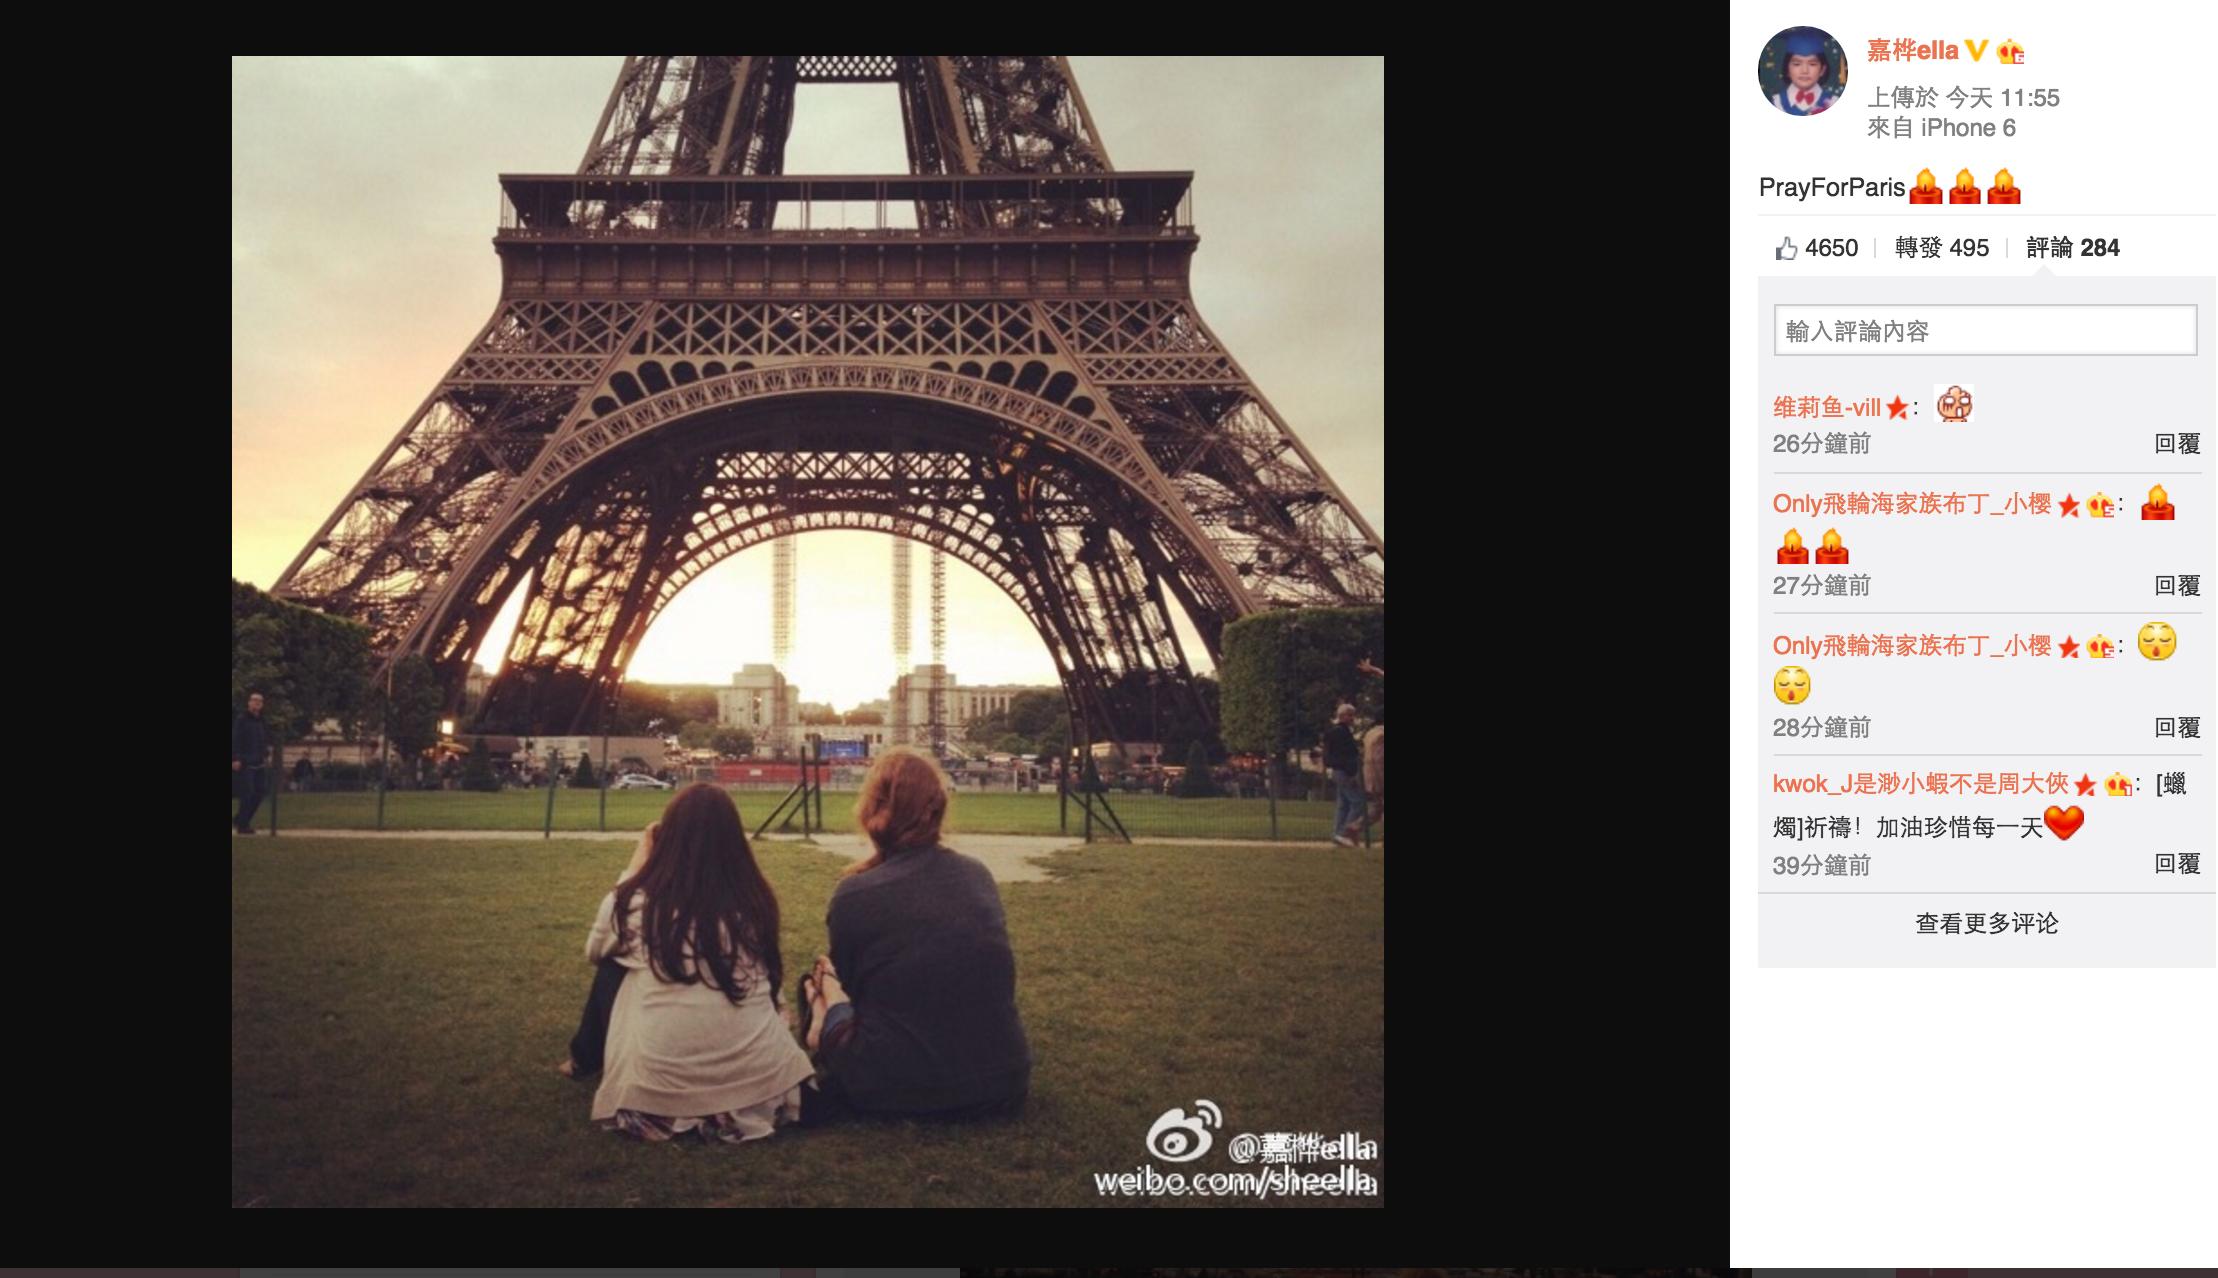 S.H.E.的Ella都在微博貼出在巴黎鐵塔下的相片,又祈求巴黎平安。(微博截圖)